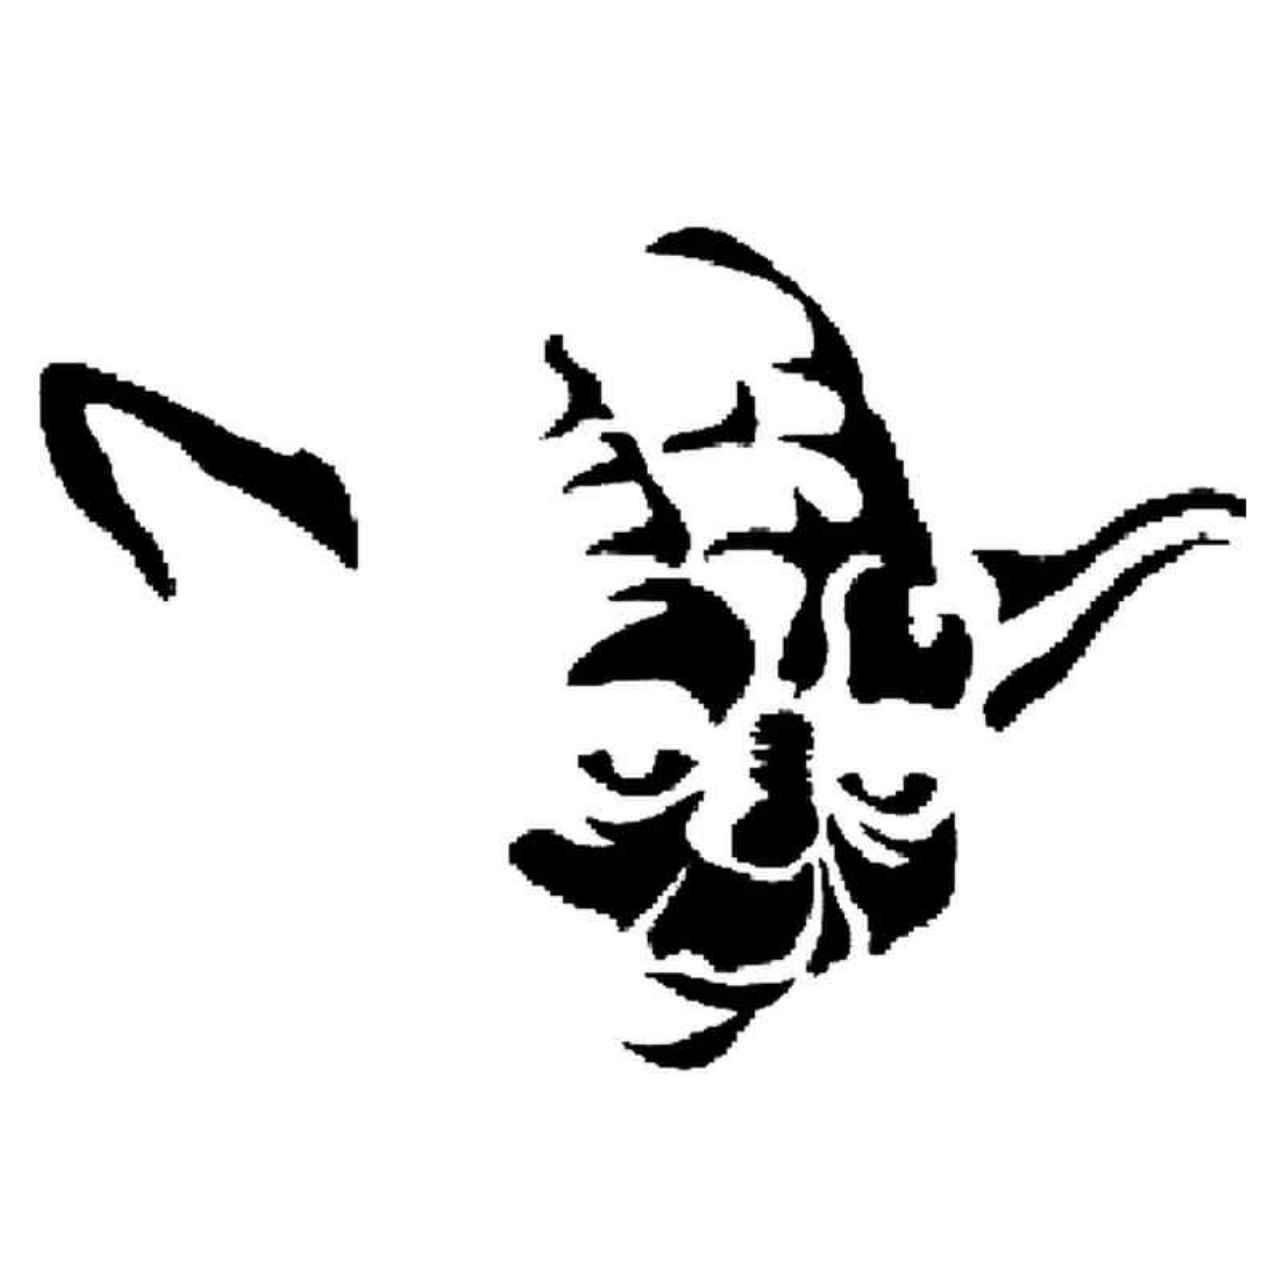 Star Wars Yoda 82 Decal Sticker